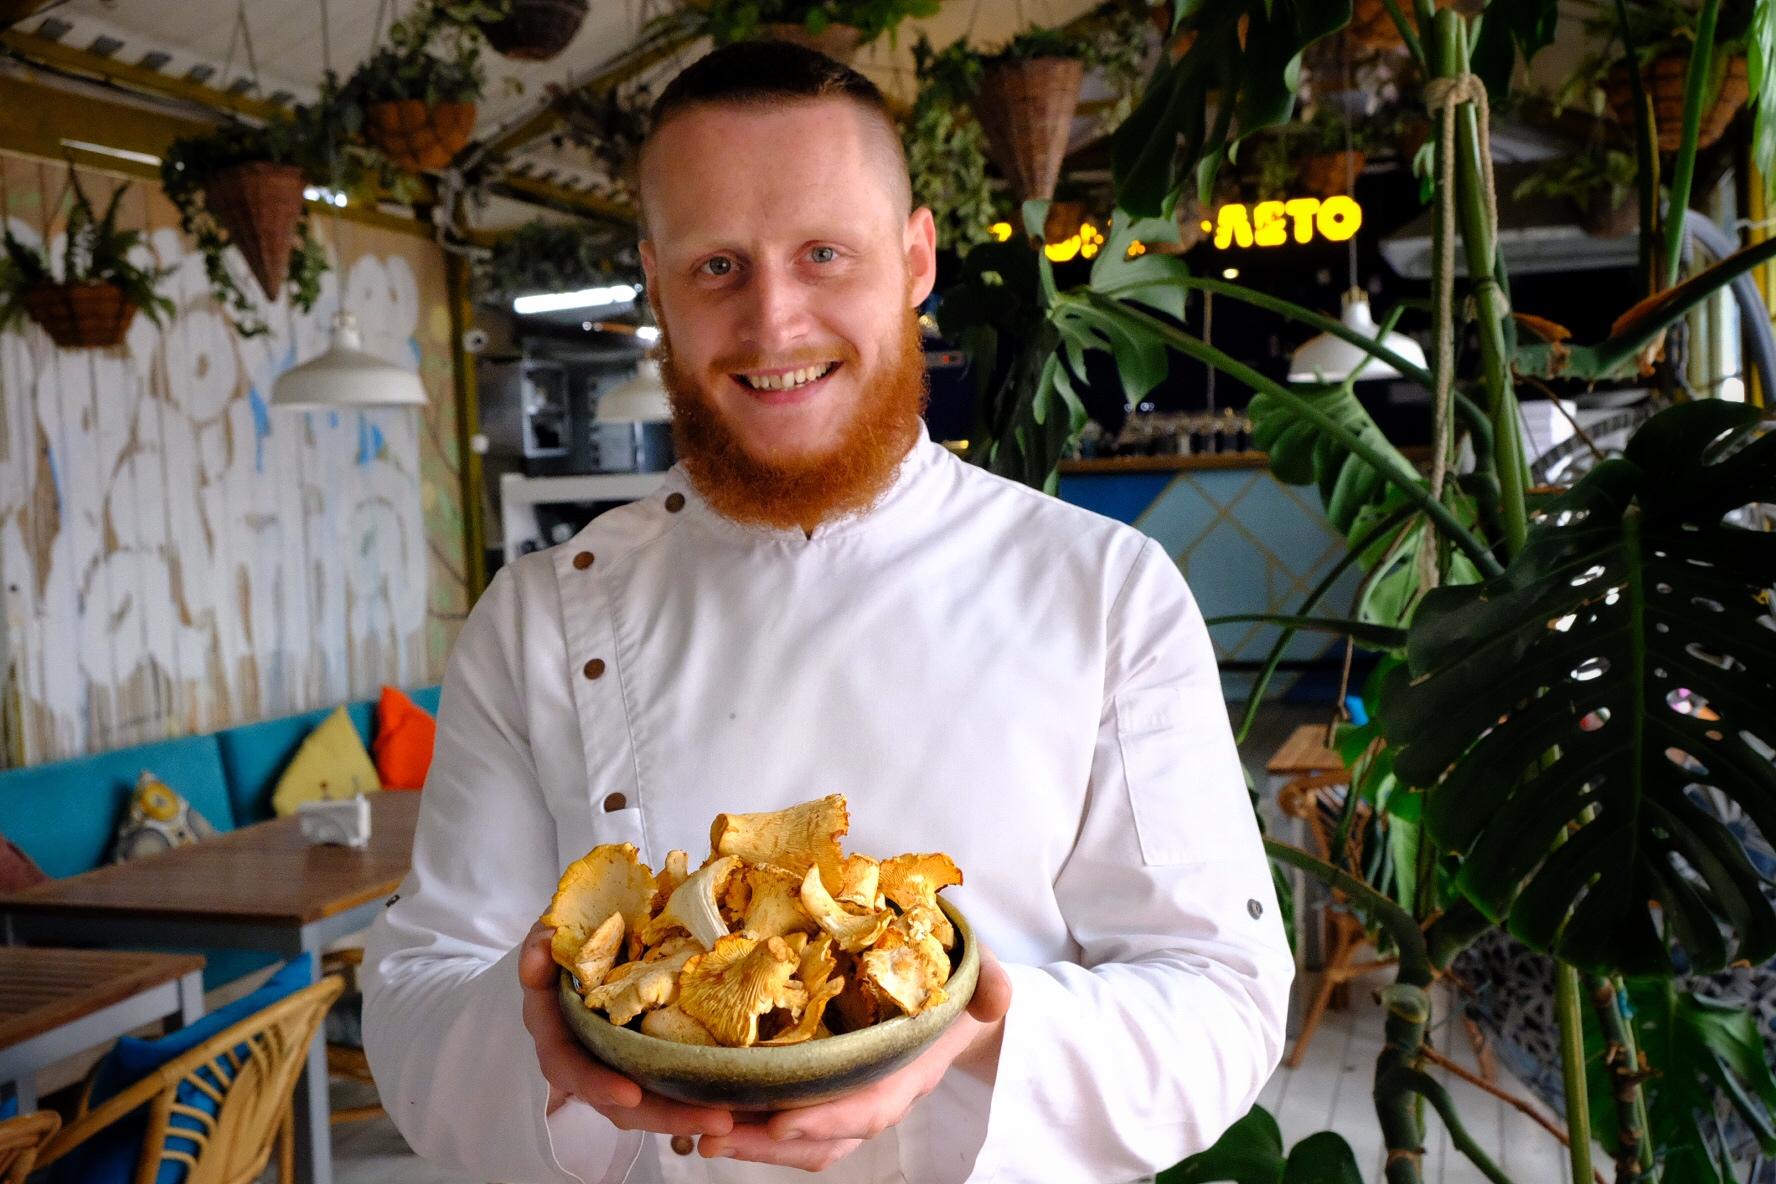 Шеф-повар «Агонь BBQ Ratskeller» приготовитстейк-мачете с жареными лисичками